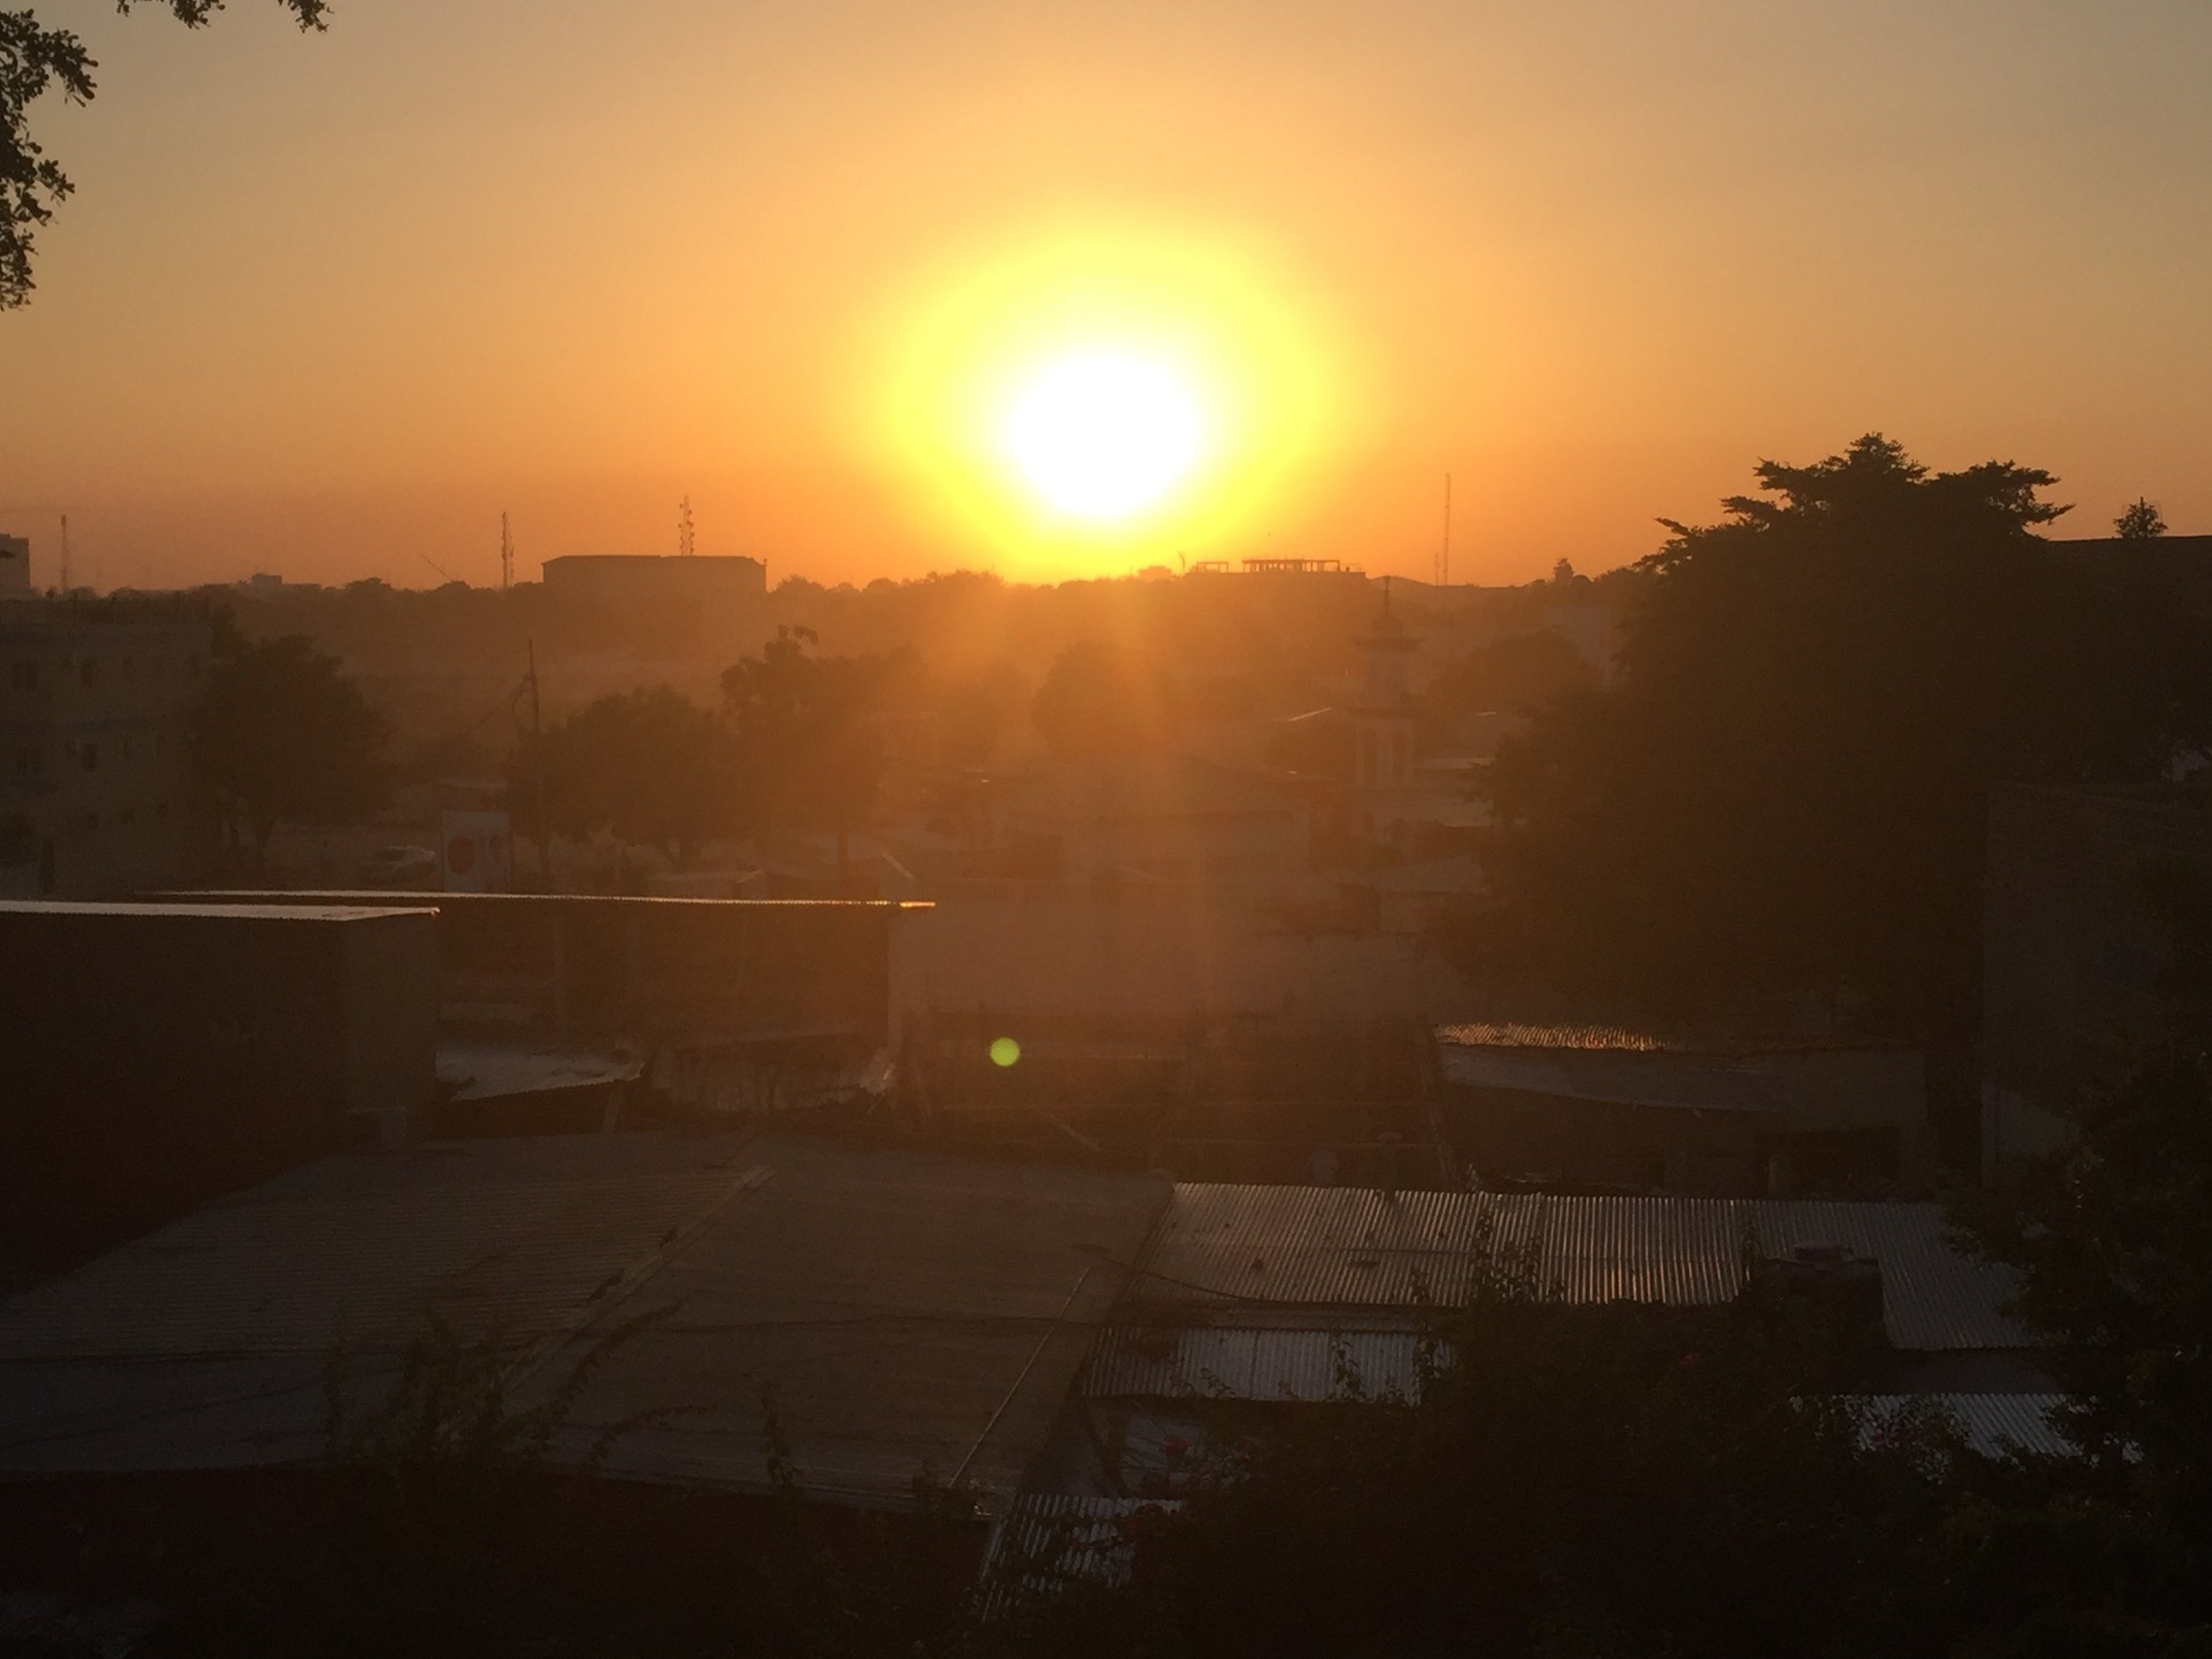 The sun setting over the N'djamena, the capital of Chad.